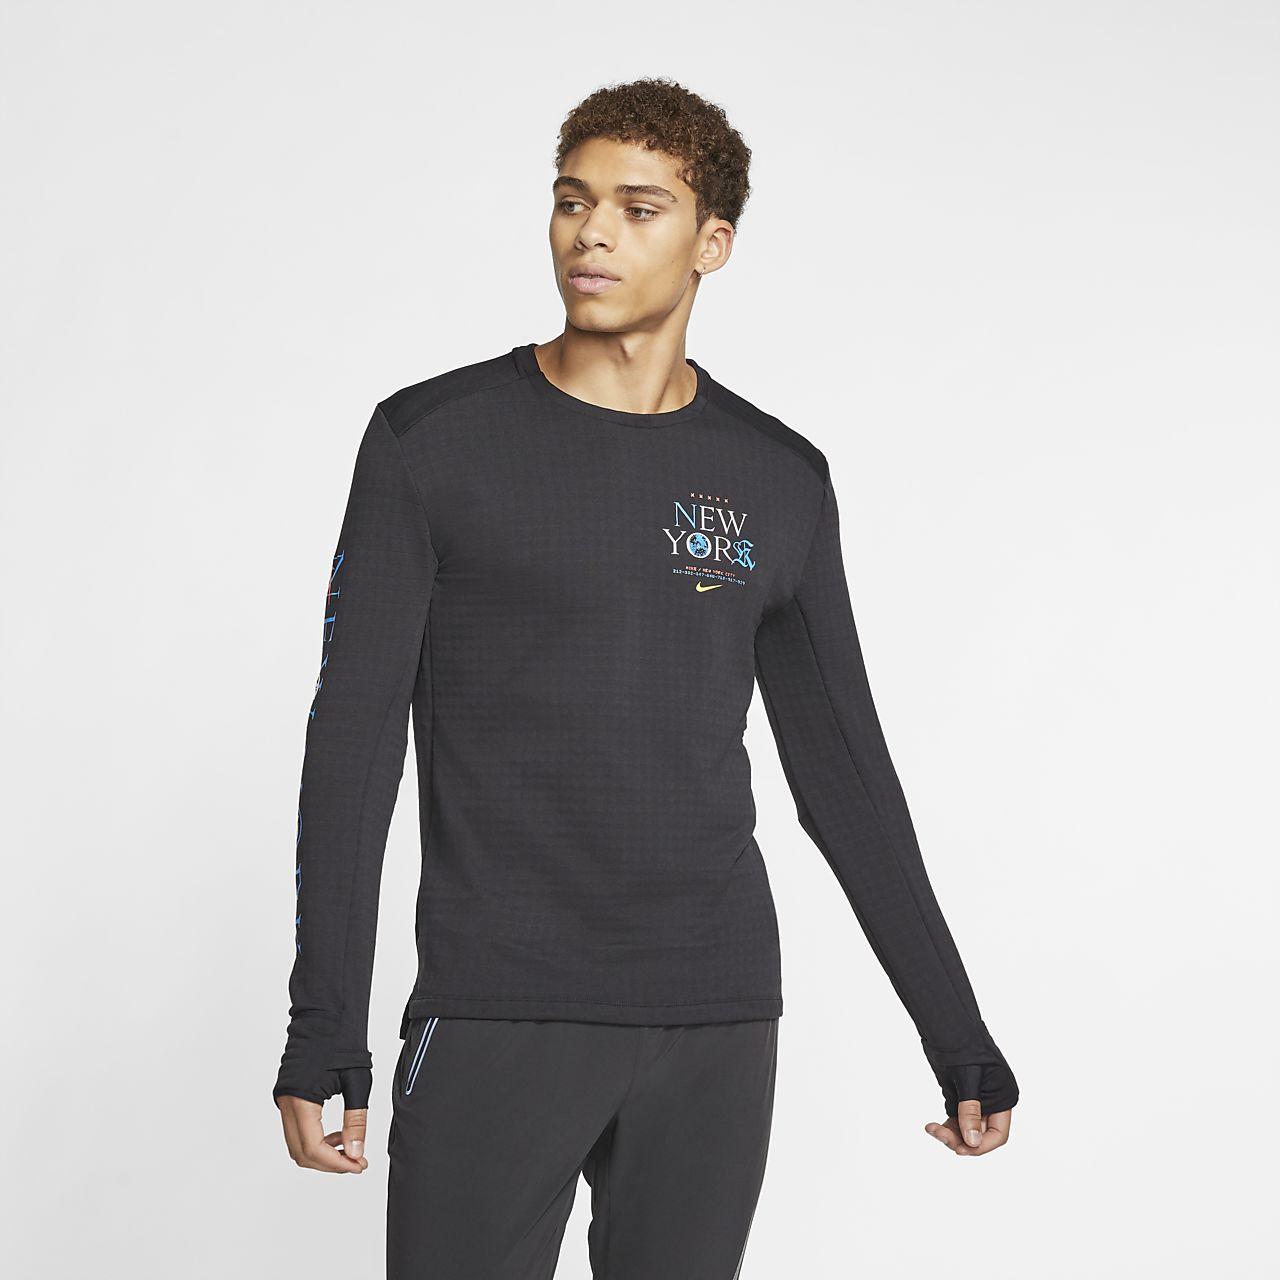 Nike Therma Sphere Element 3.0 NYC Men's Long-Sleeved Running Top